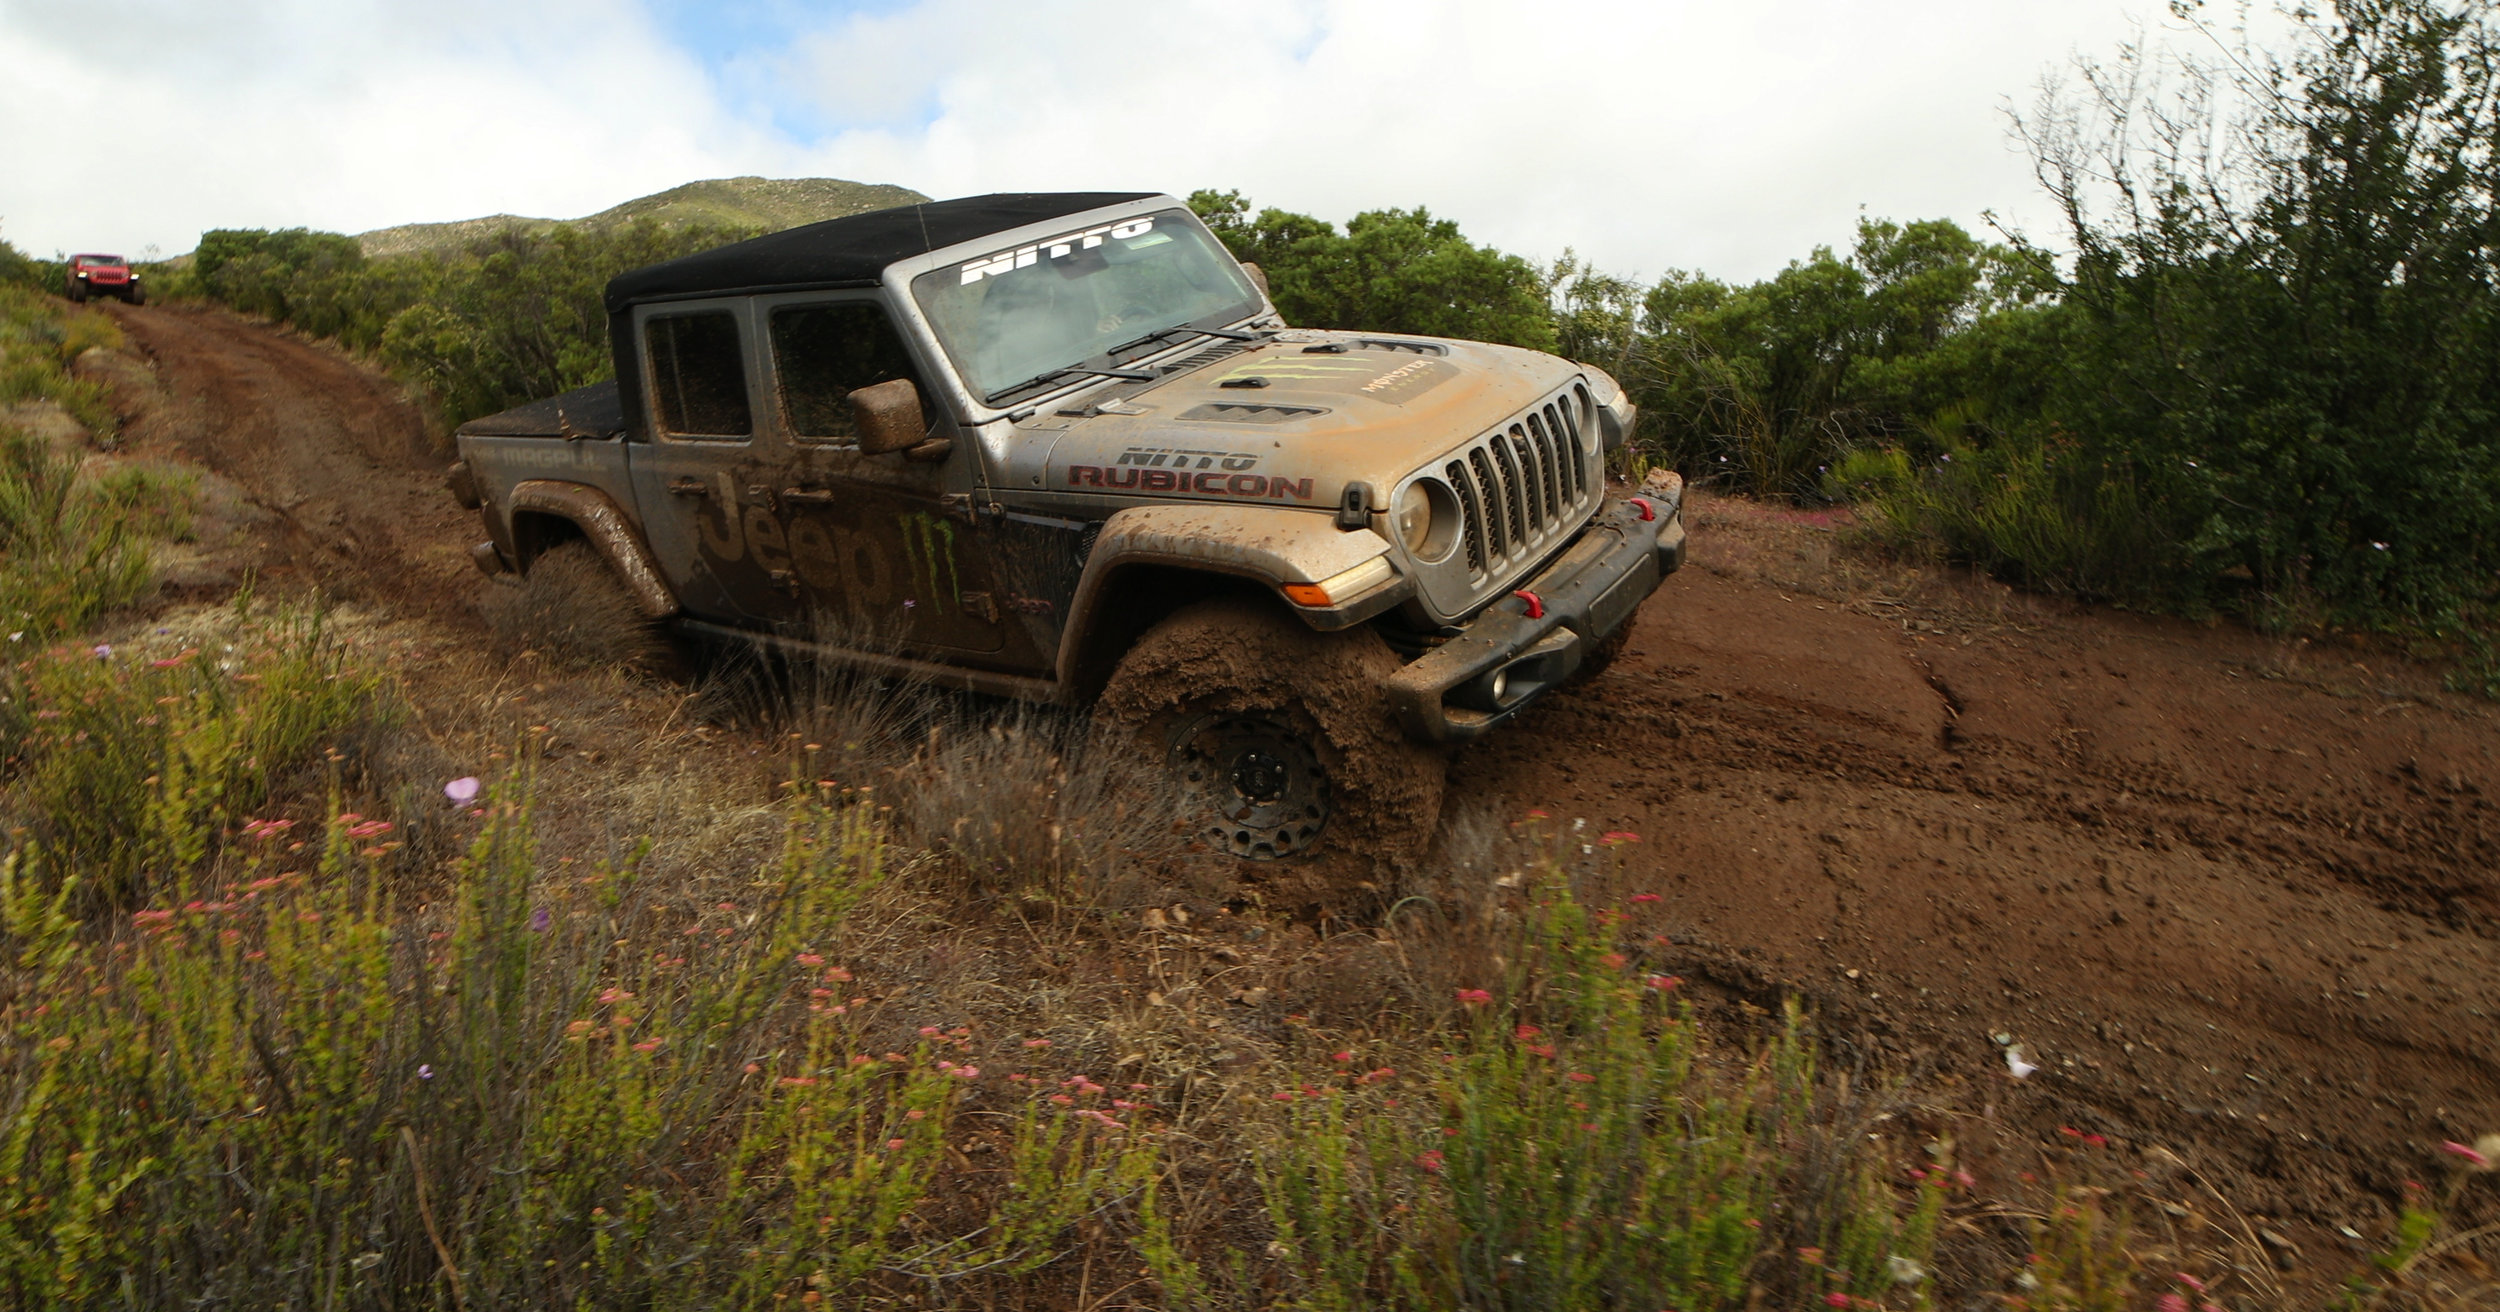 6_24_CaseyCurrie_Baja500PreRunning_BajaMexico_Jeep_026.jpg